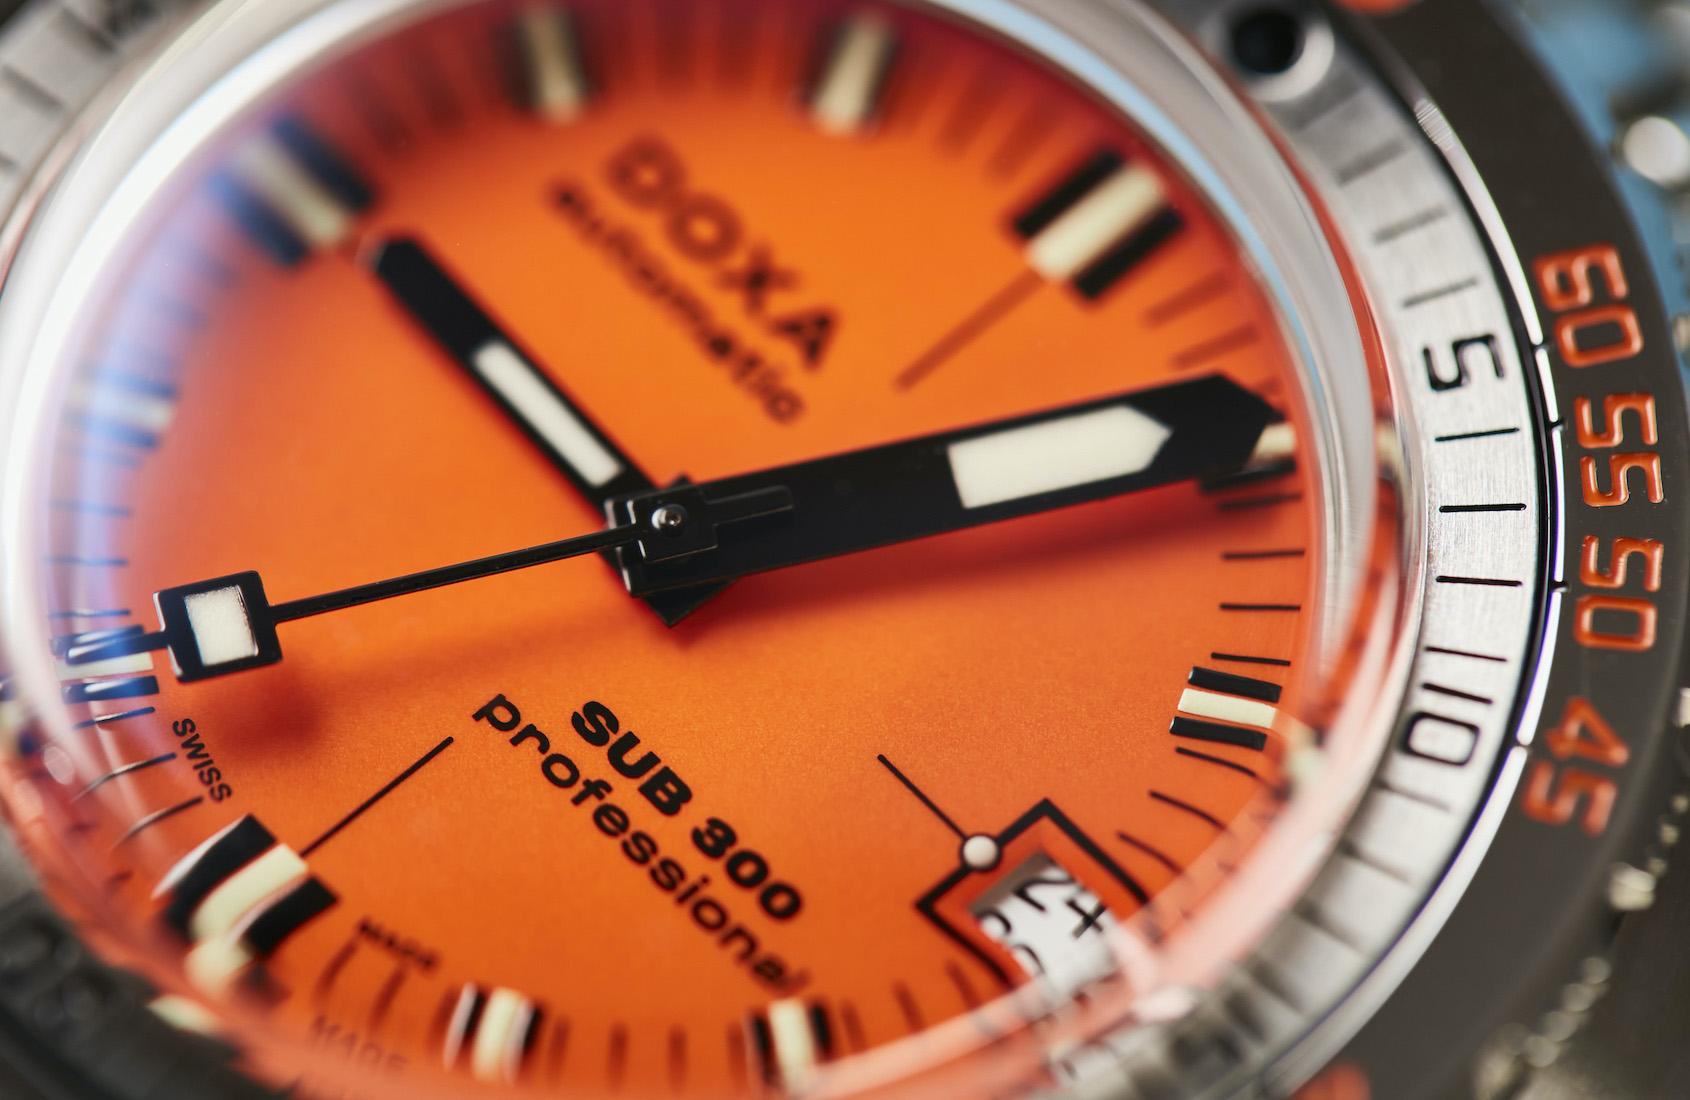 DOXA SUB 300 review price 2020